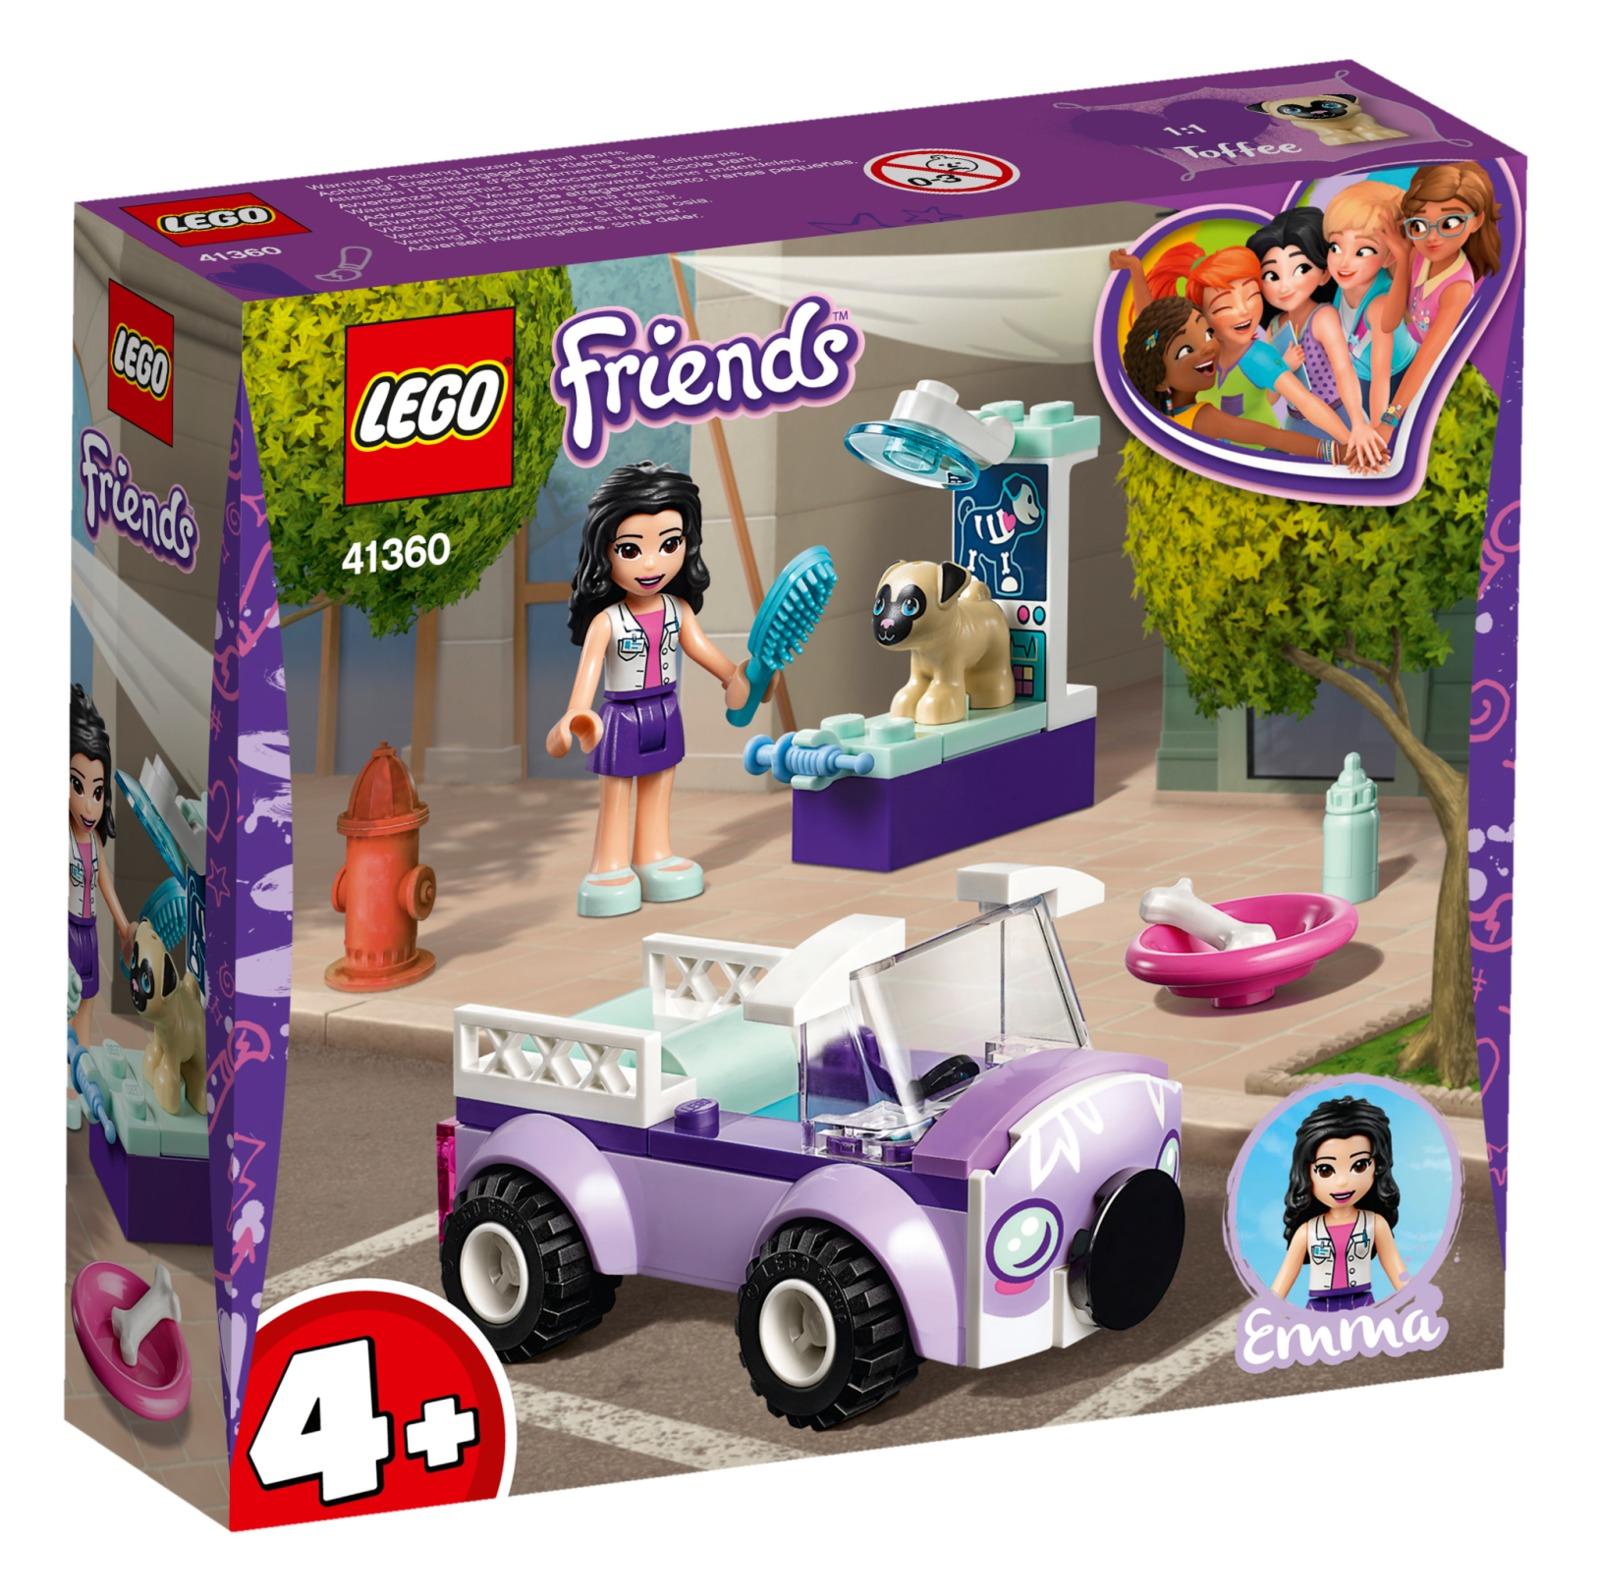 LEGO Friends: Emma's Mobile Vet Clinic (41360) image